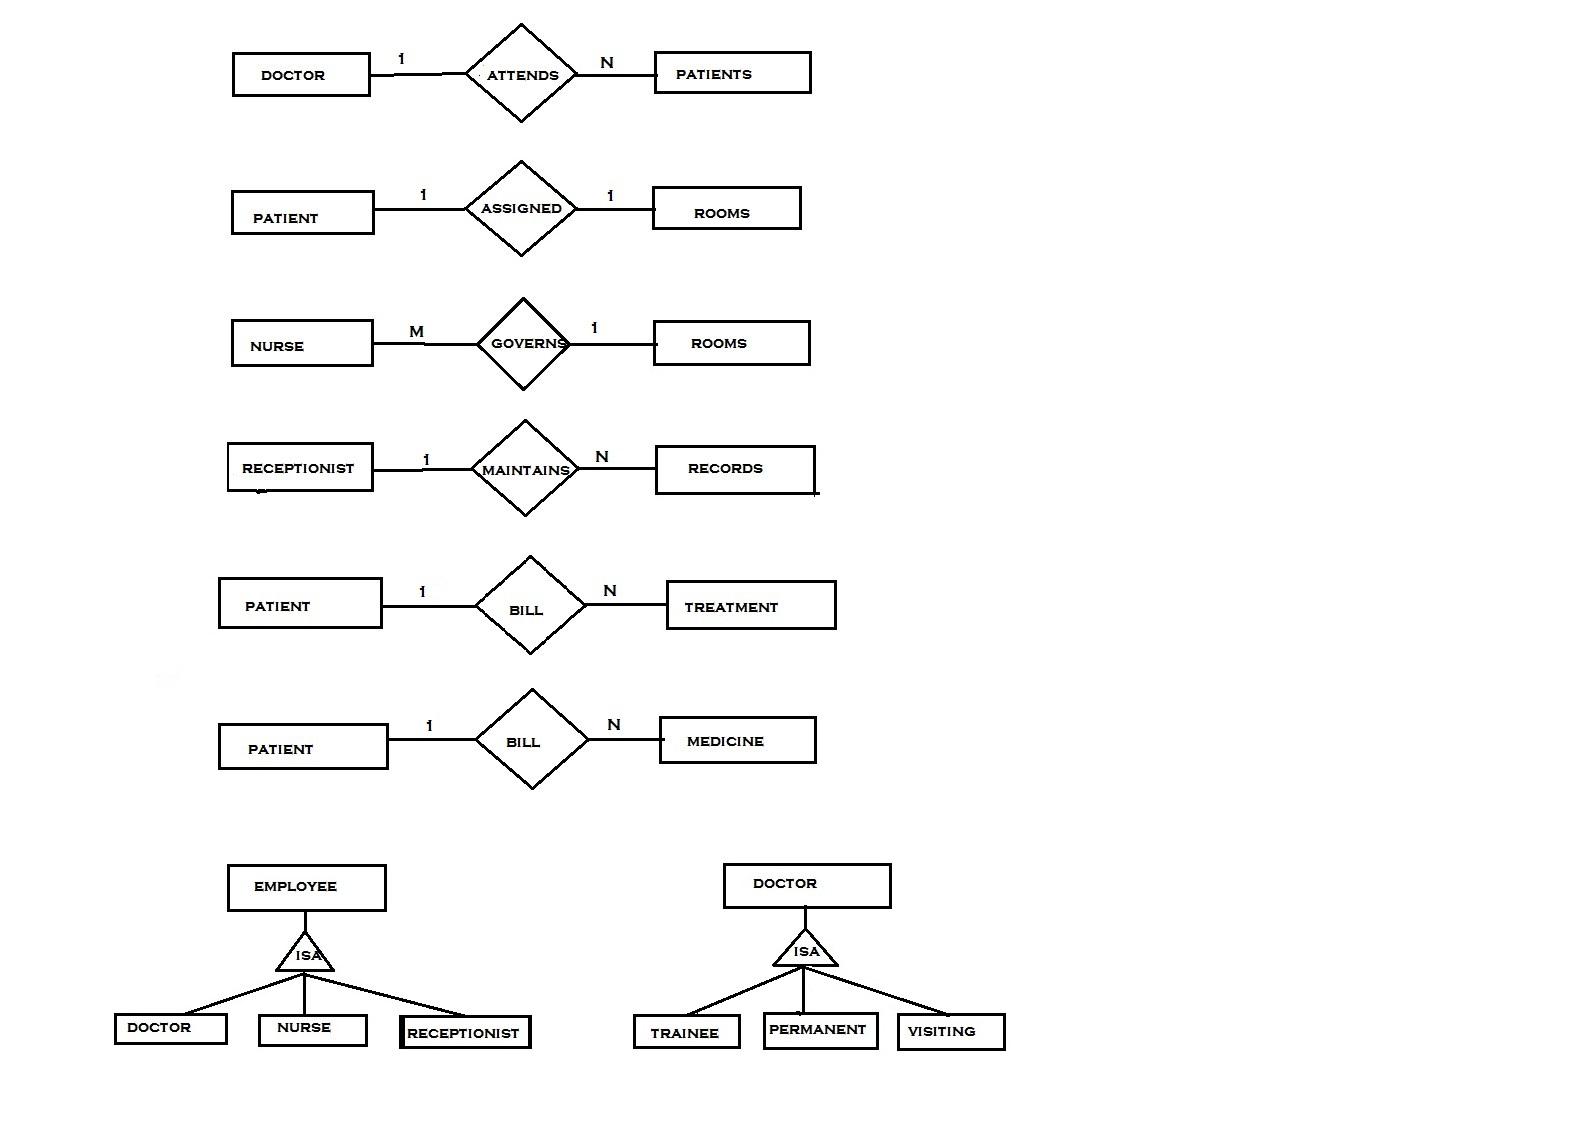 Extended Er Diagrams | Lbs Kuttipedia intended for Extended Er Diagram Examples